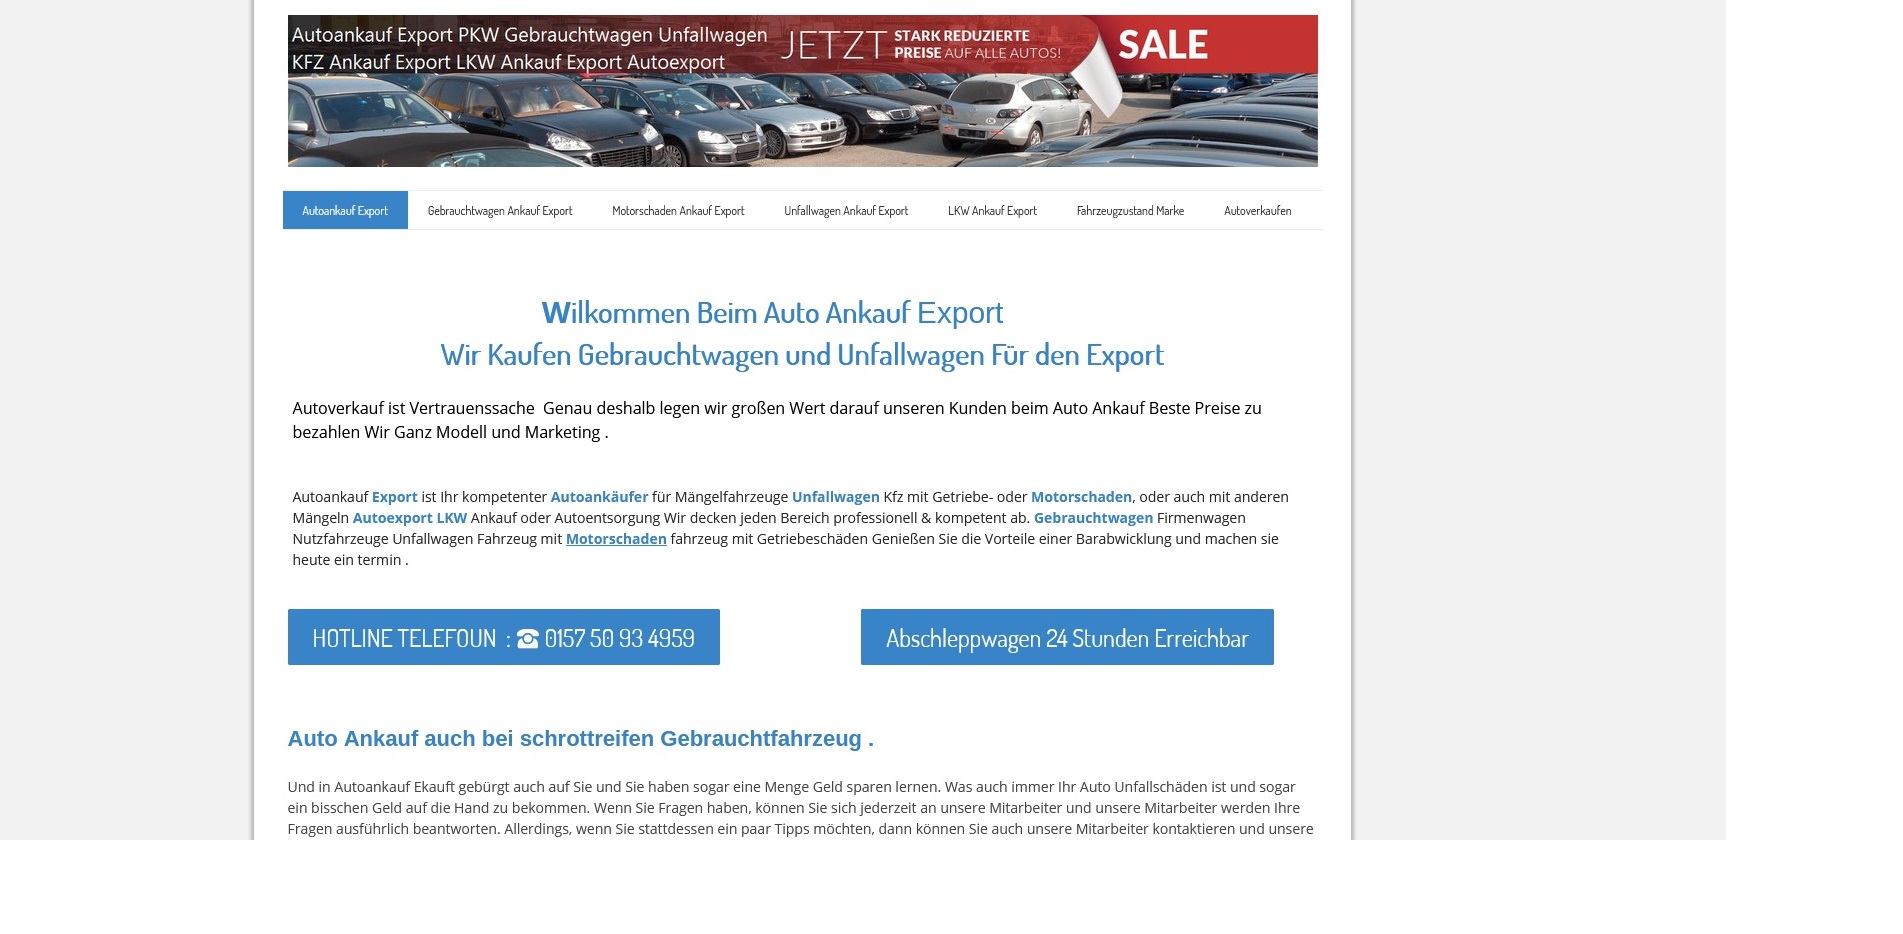 https://www.kfz-ankauf-export.de - Autoankauf Heinsberg